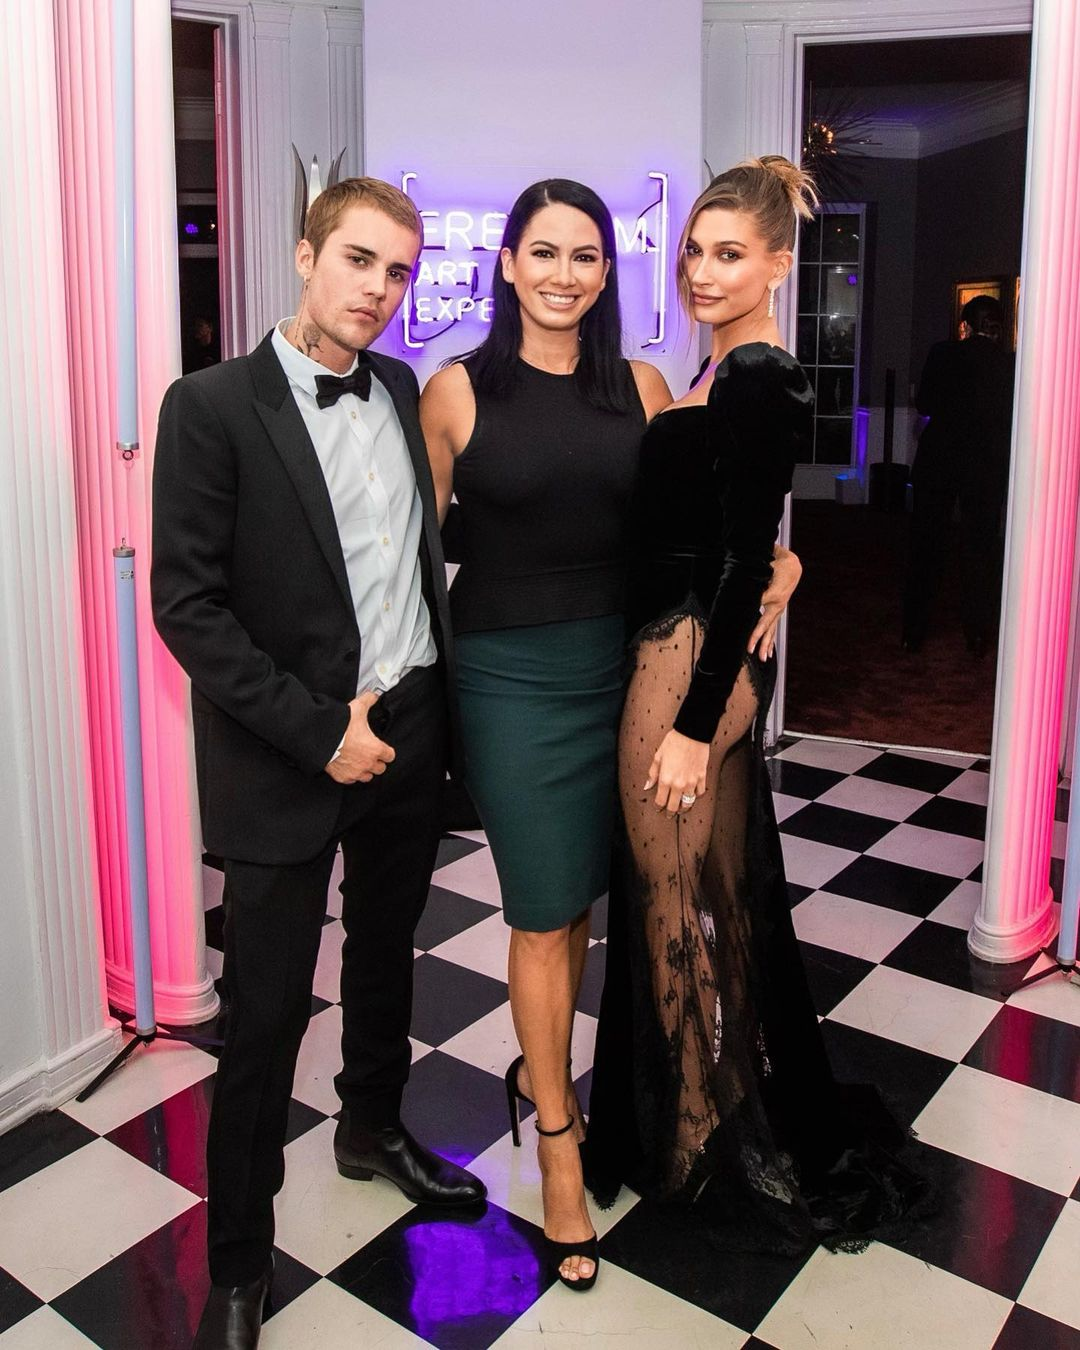 Образ дня: Хейли Бибер в бархатном платье Alessandra Rich